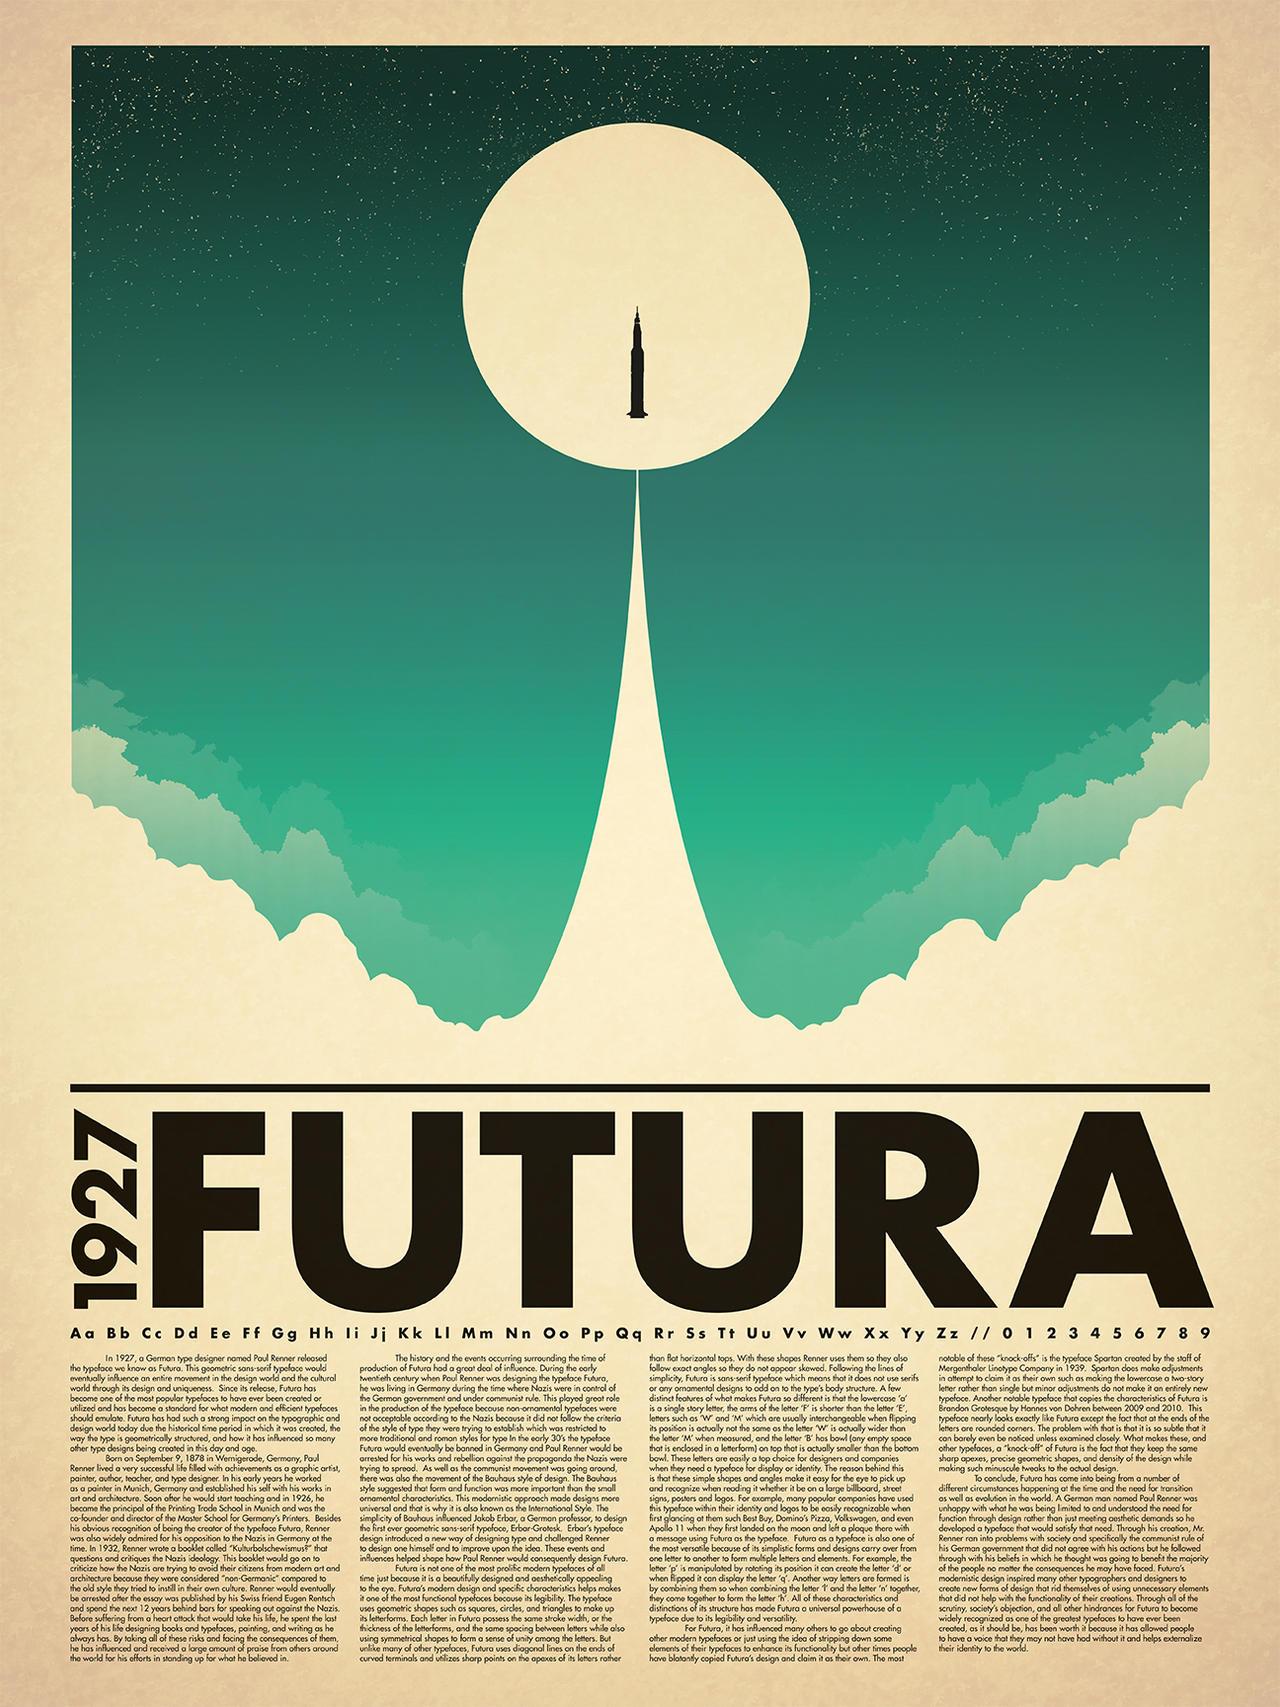 futura typography poster by redx raven on deviantart